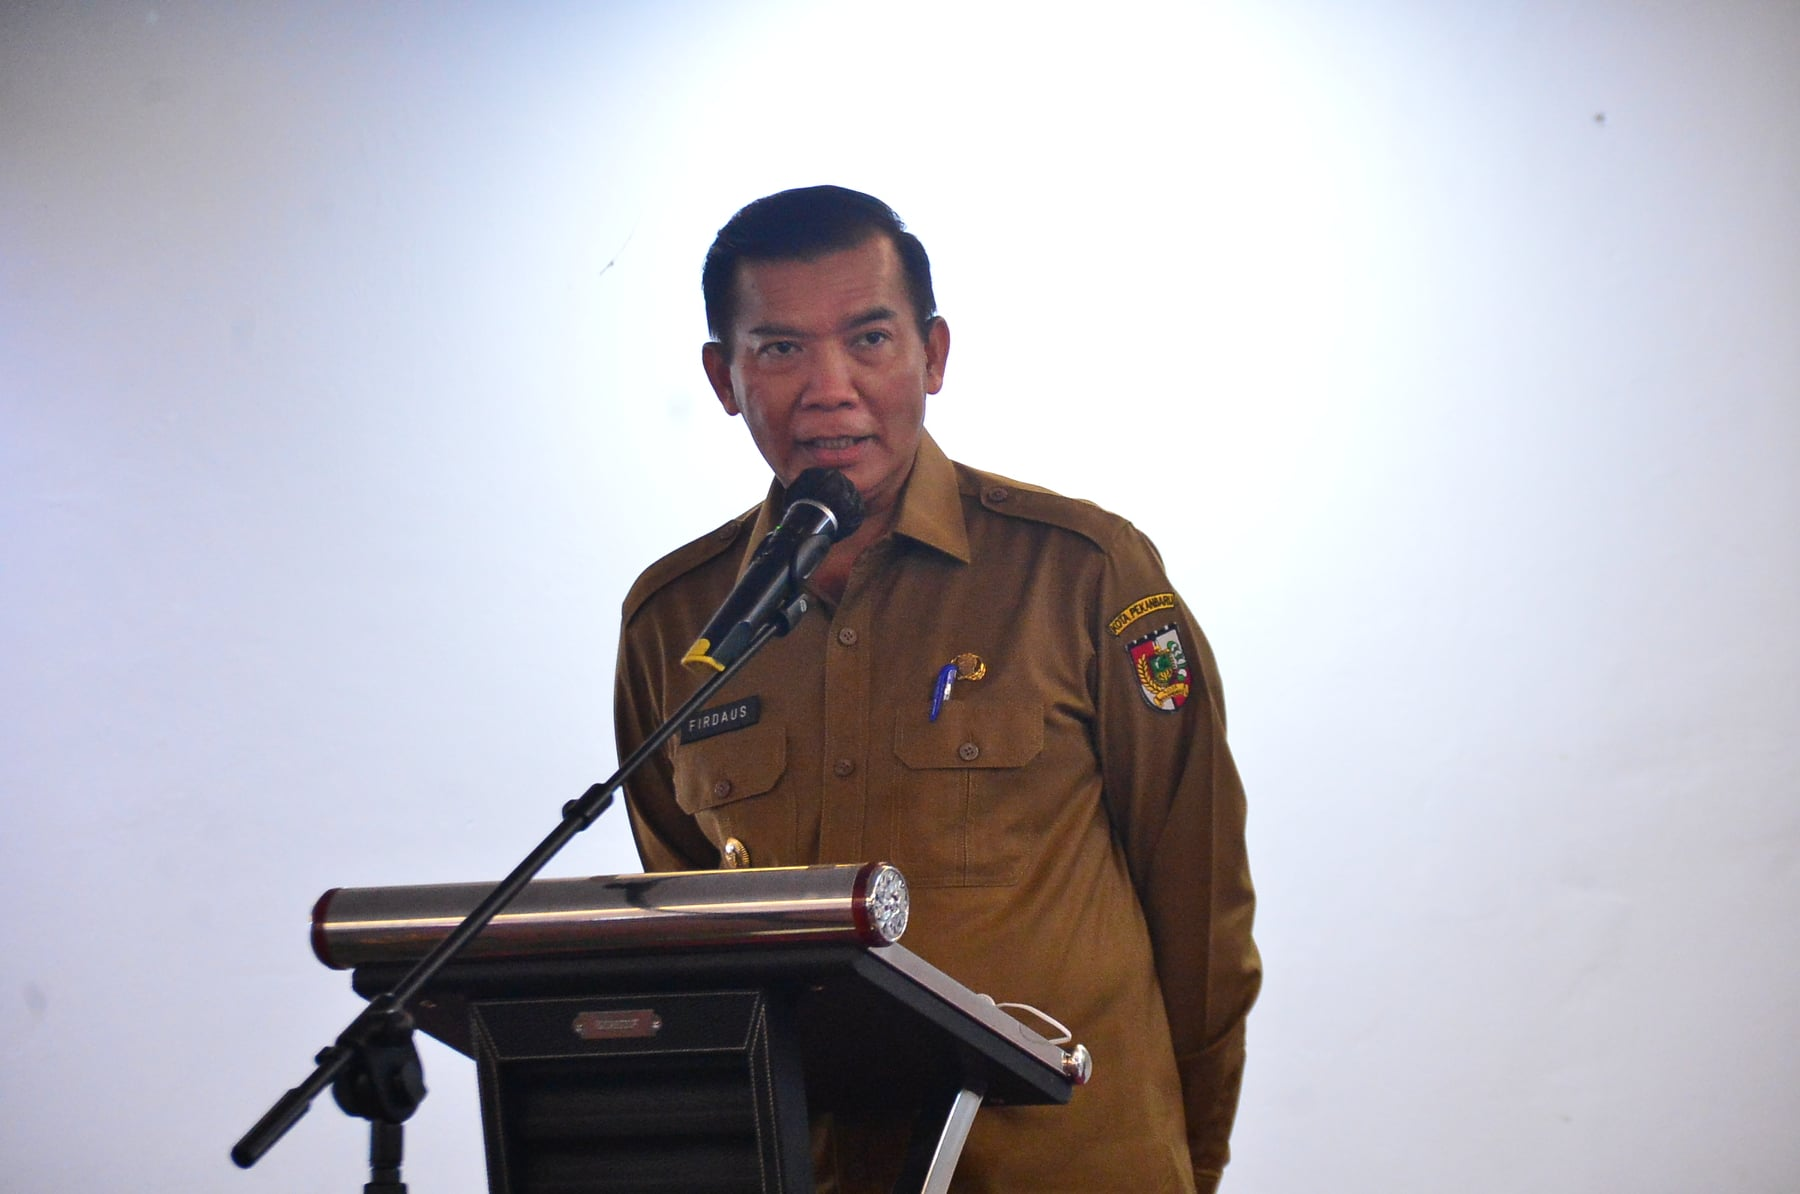 Wali Kota Pekanbaru: Warga di Zona Oranye dan Zona Merah Covid-19 Ibadah Ramadan di Rumah Saja